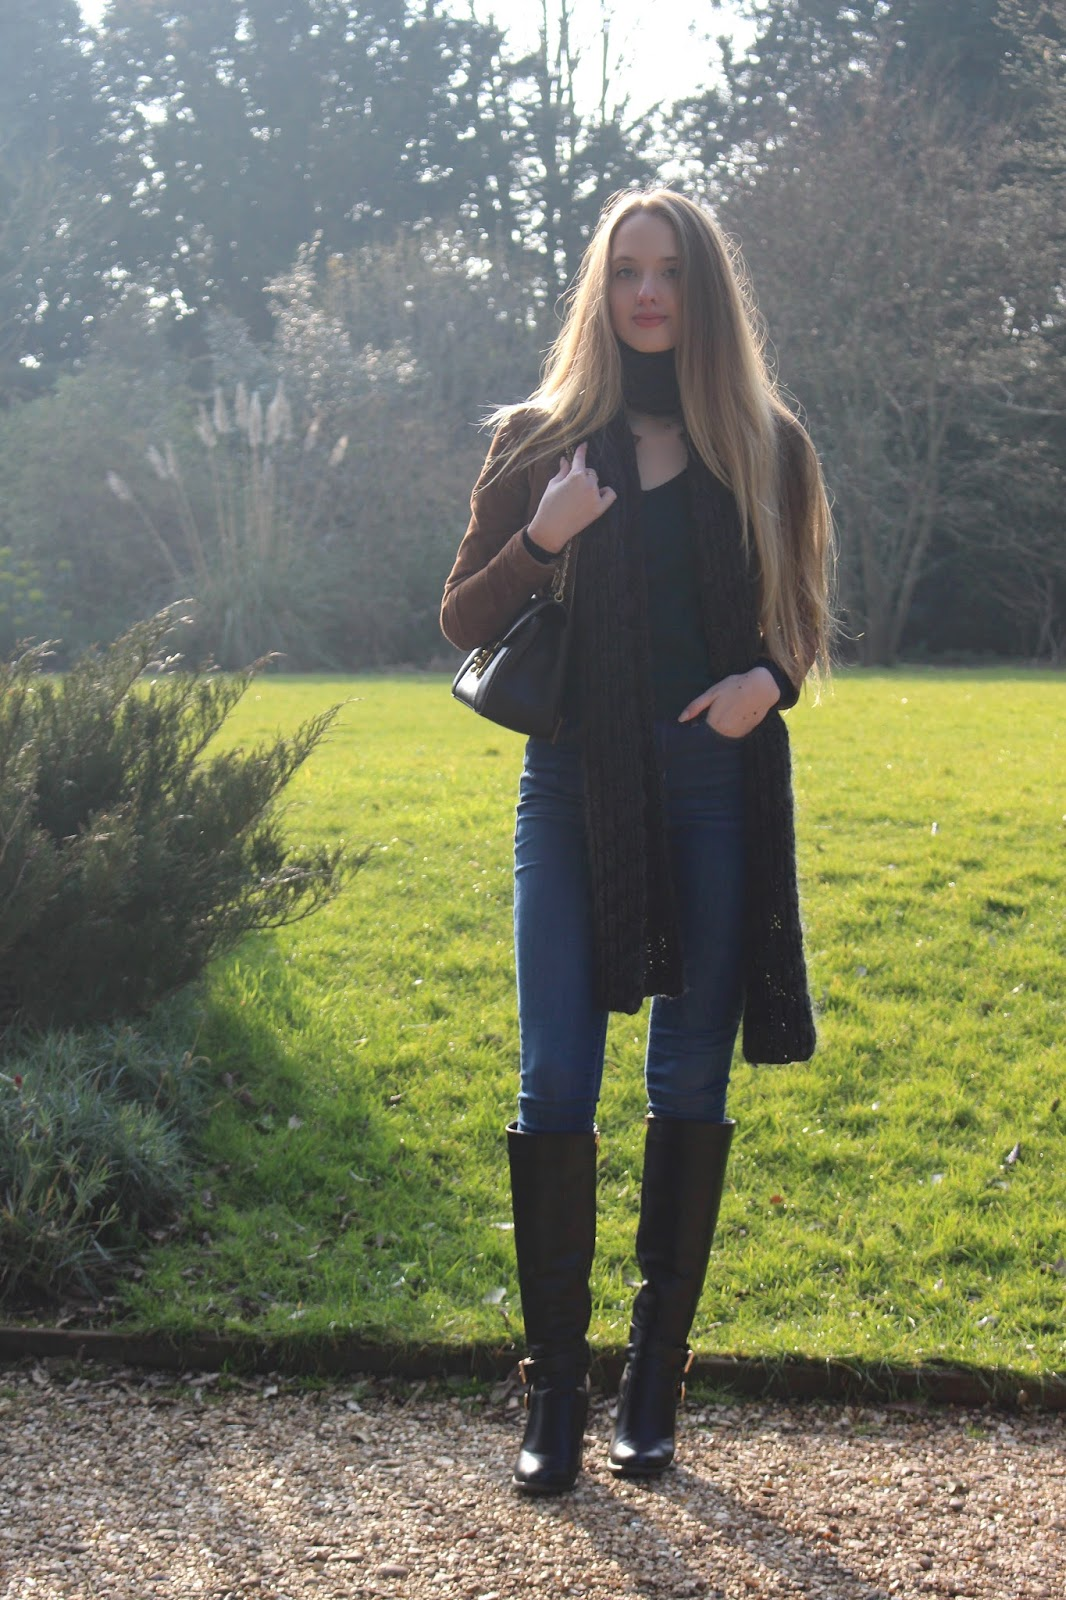 basildon park blogger visit